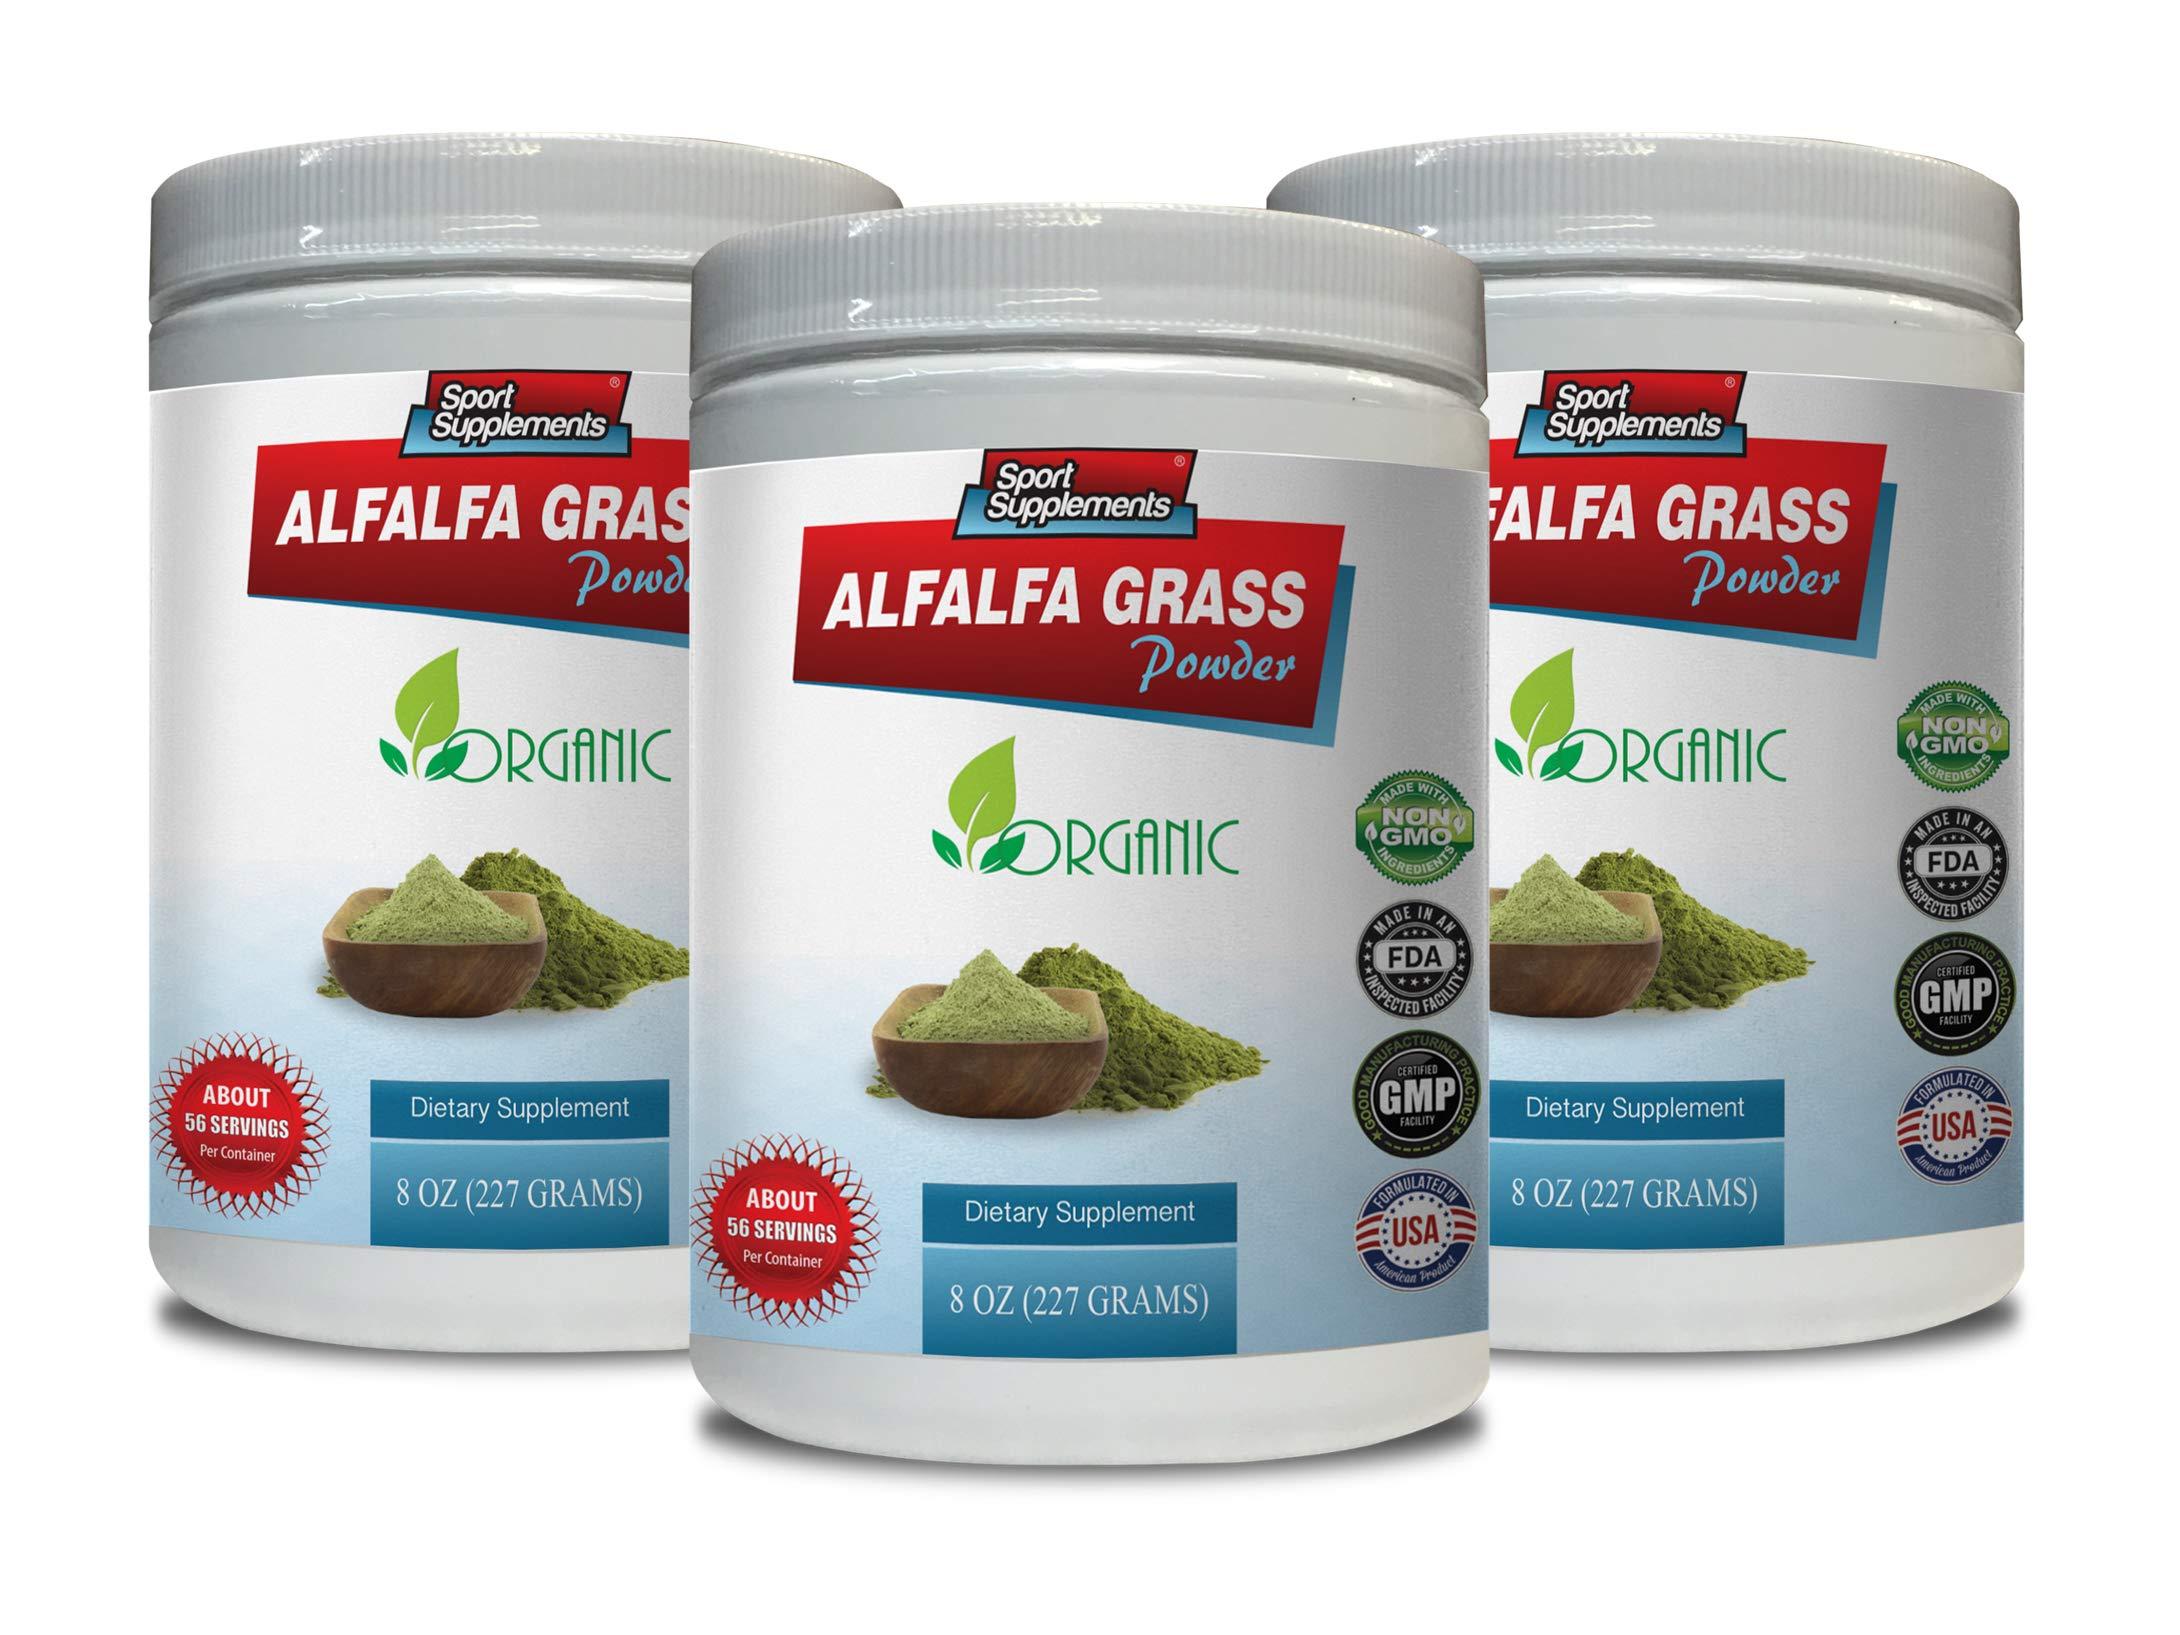 antioxidant Complex Dietary Supplement - Alfalfa Grass Powder - Organic Dietary Supplement - Digestion aid - 3 Cans 24 OZ (168 Servings)